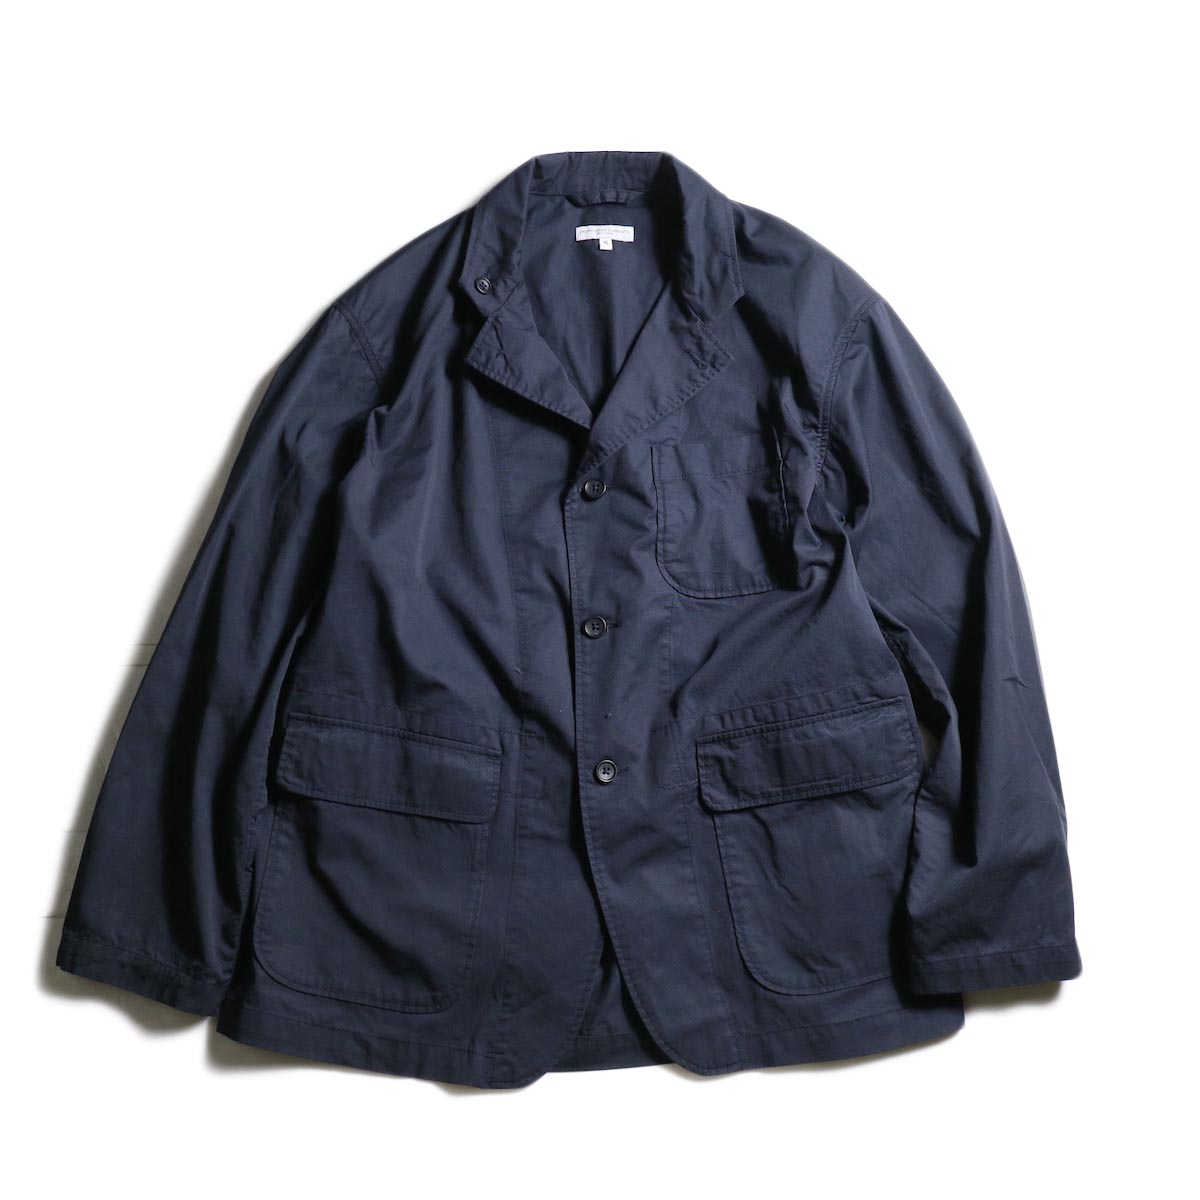 Engineered Garments / Loiter Jacket -High Count Twill (Dk.Navy)